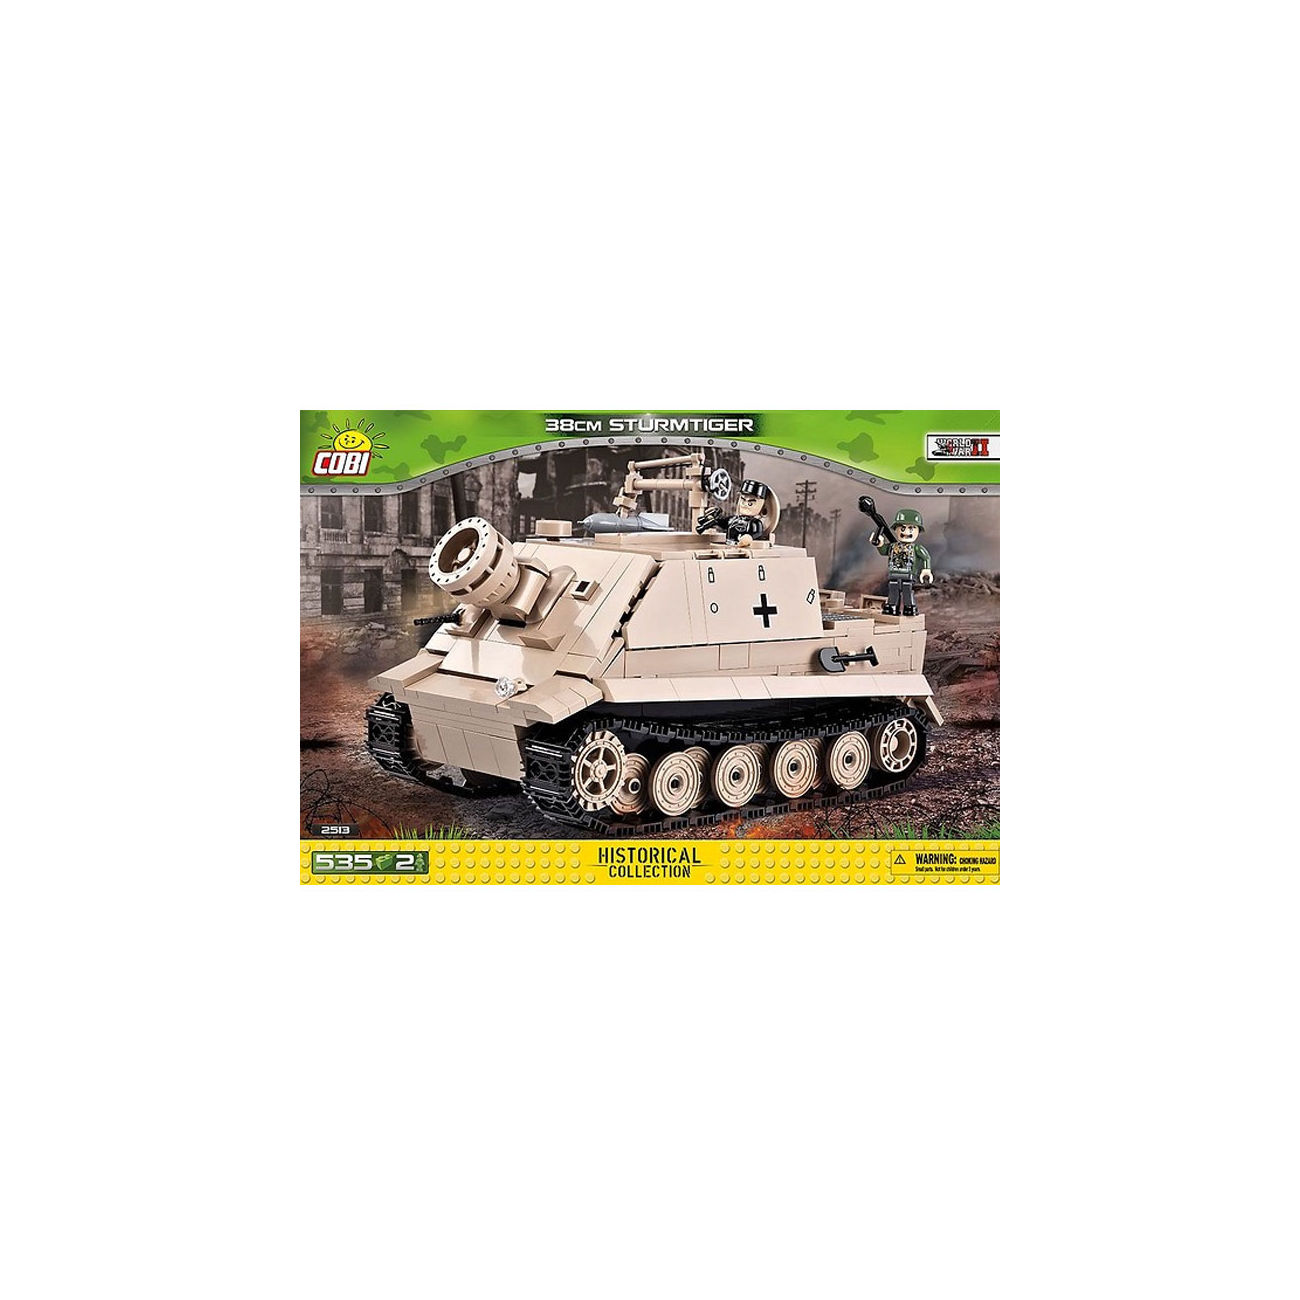 COBI 2513 38CM STURMMORSER Bau- & Konstruktionsspielzeug-Sets